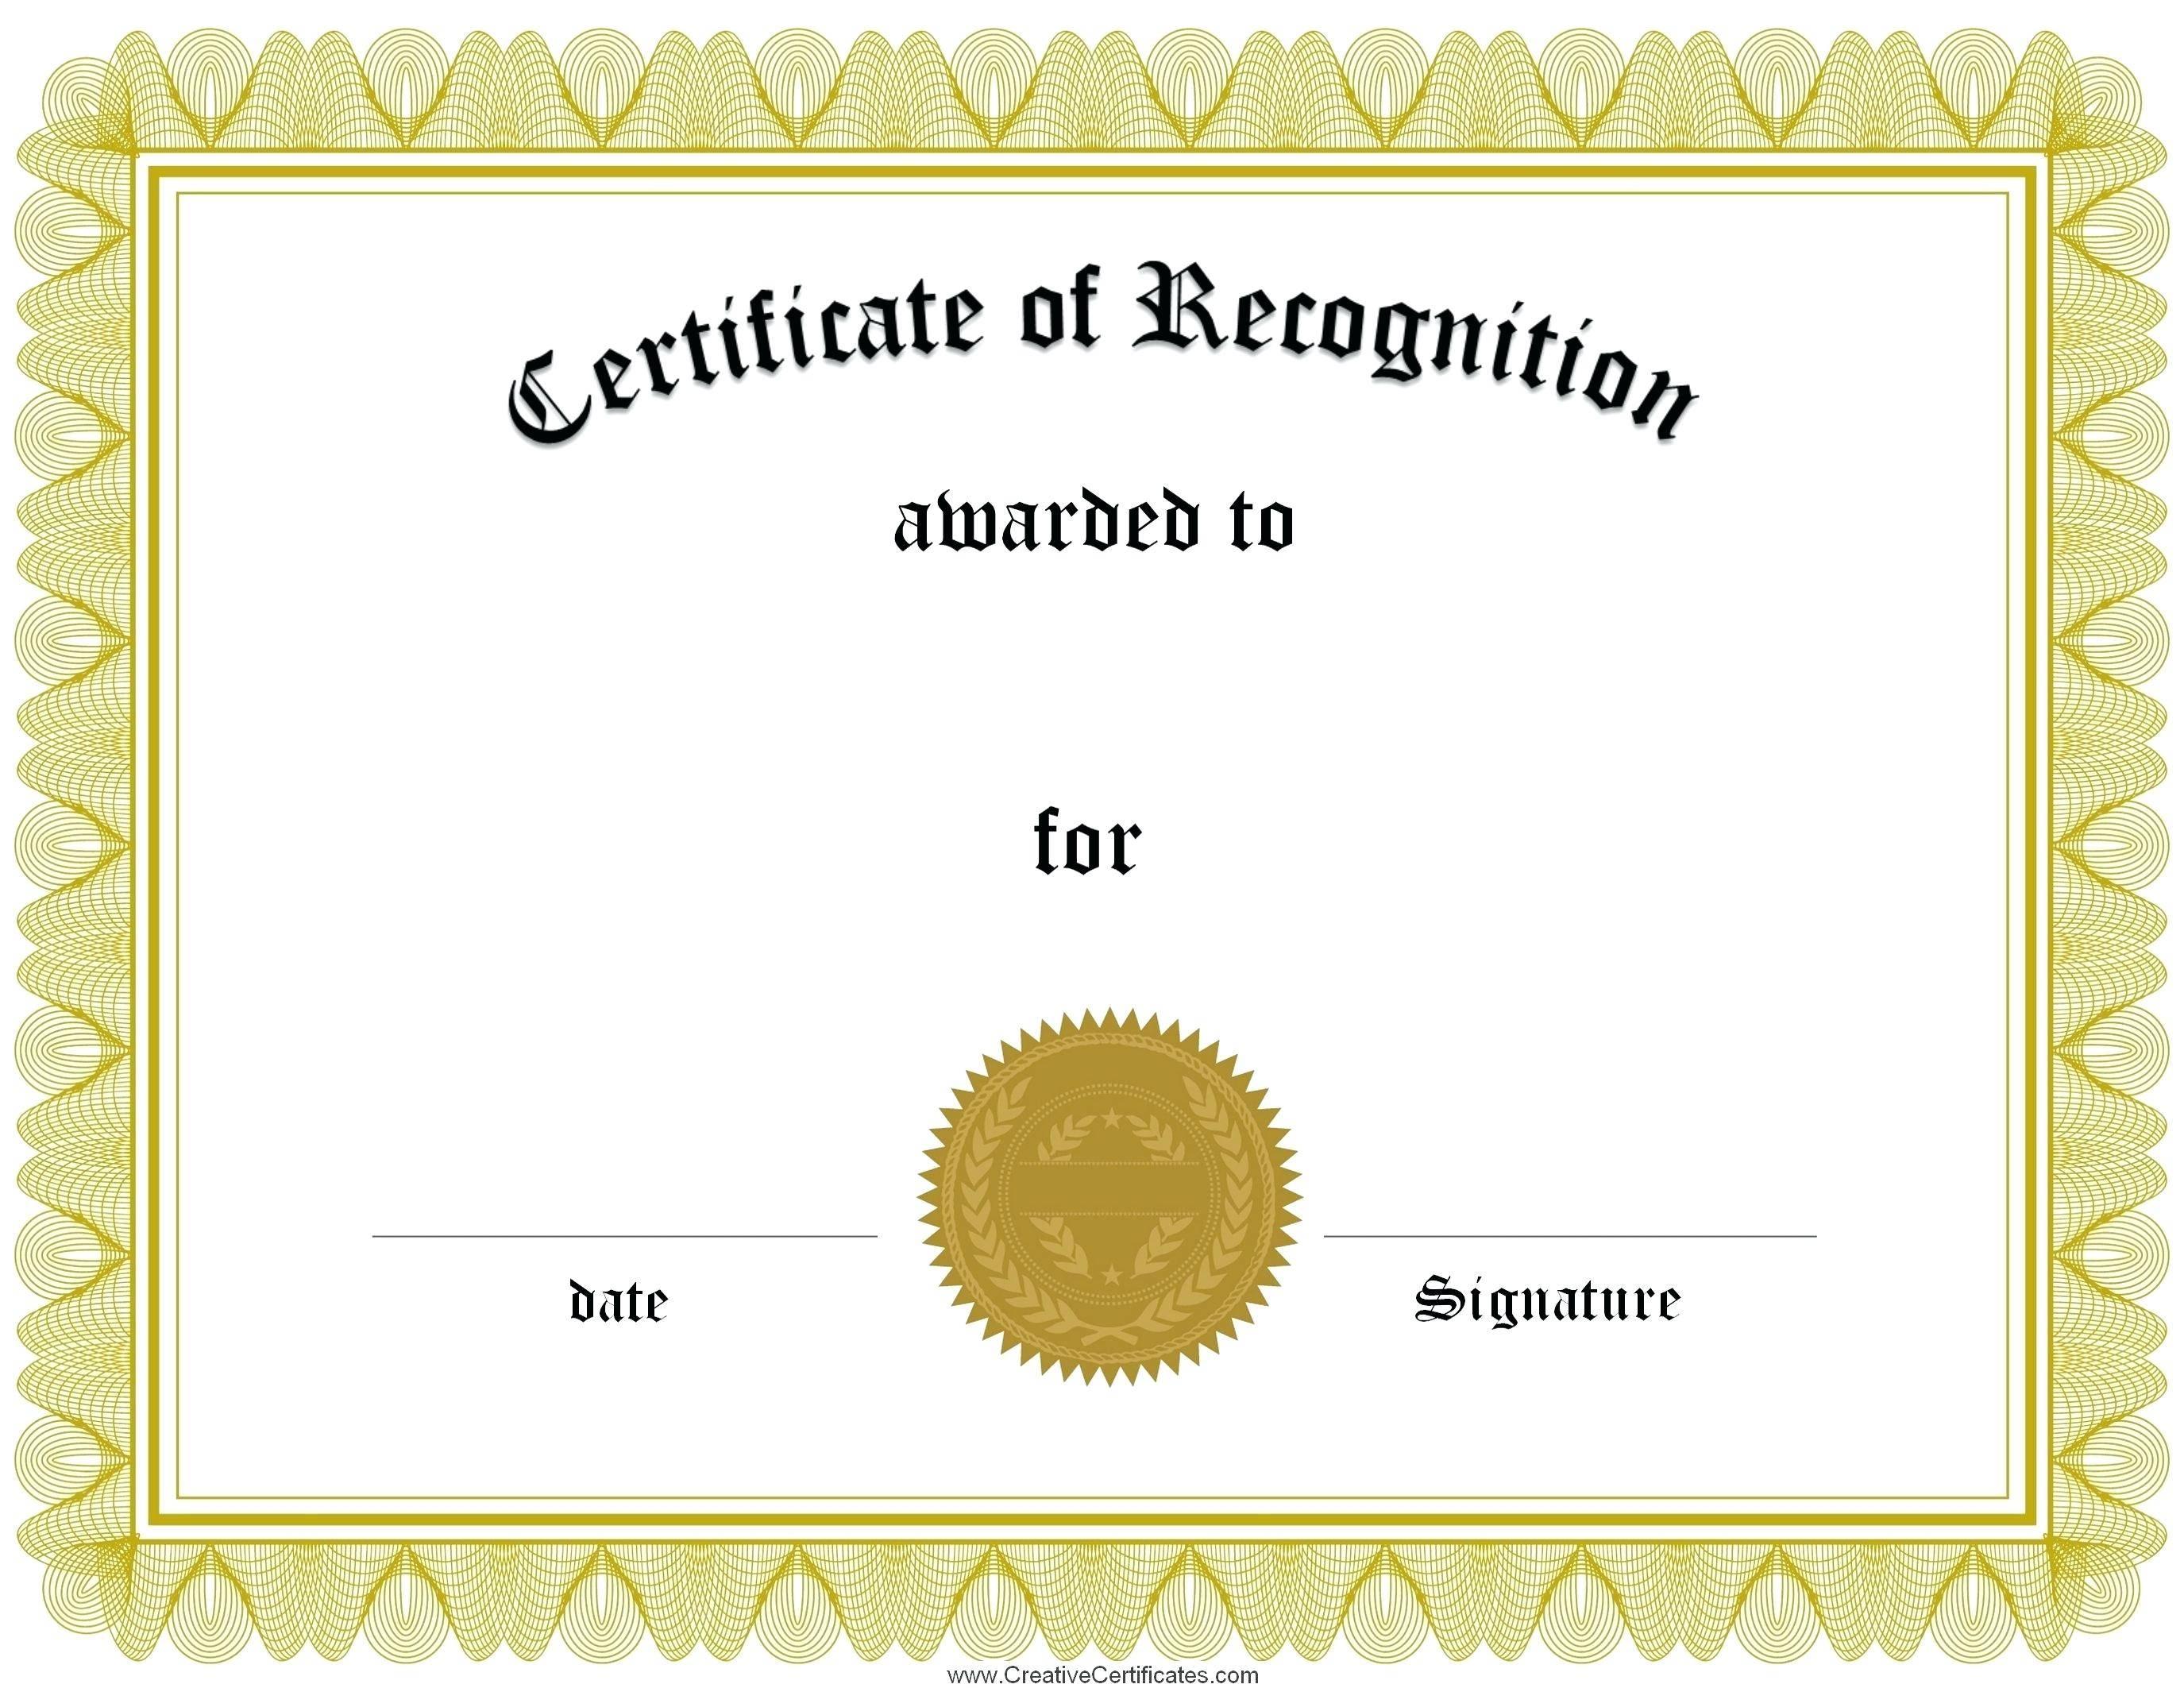 Template Certificate Of Appreciation For Volunteering